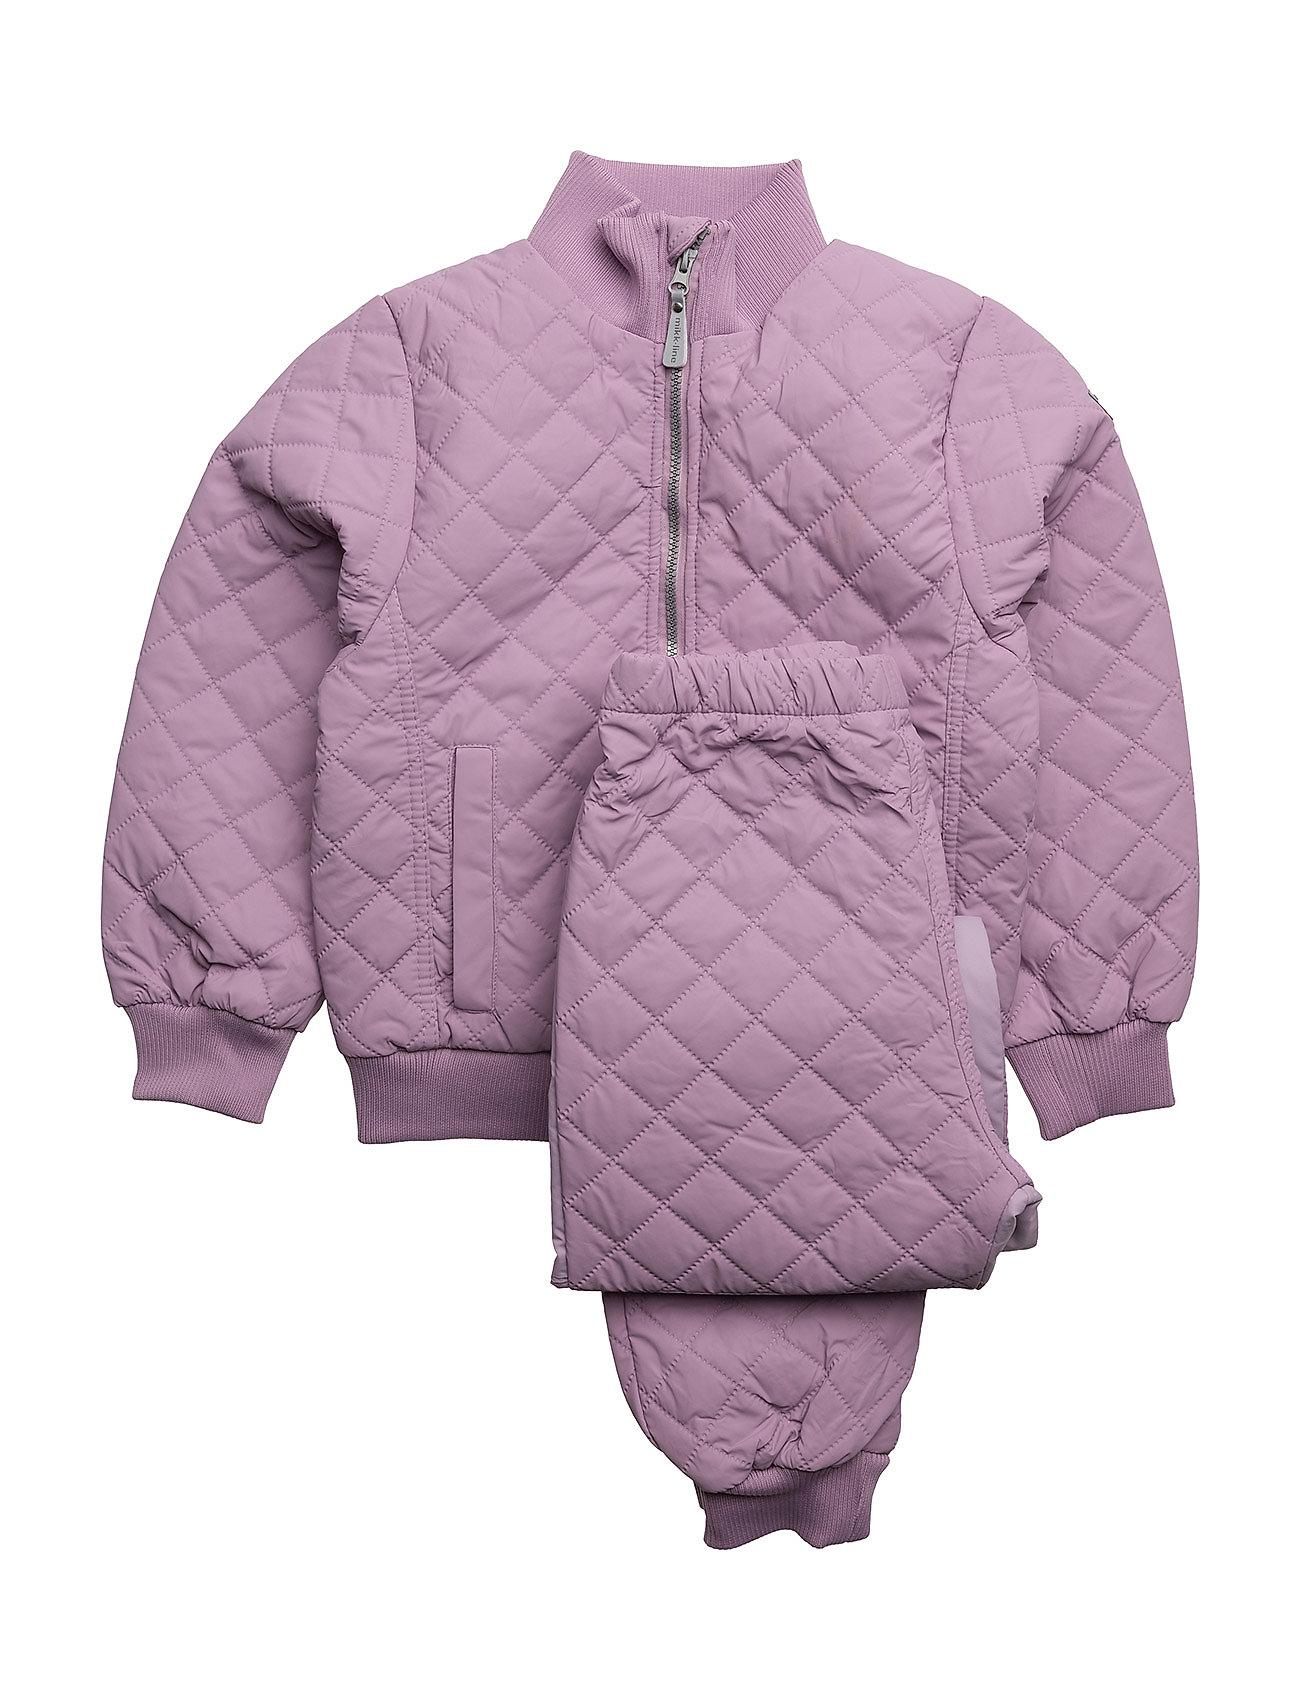 Duvet Set W/Fleece Mikk-Line Thermo & Softshells til Børn i